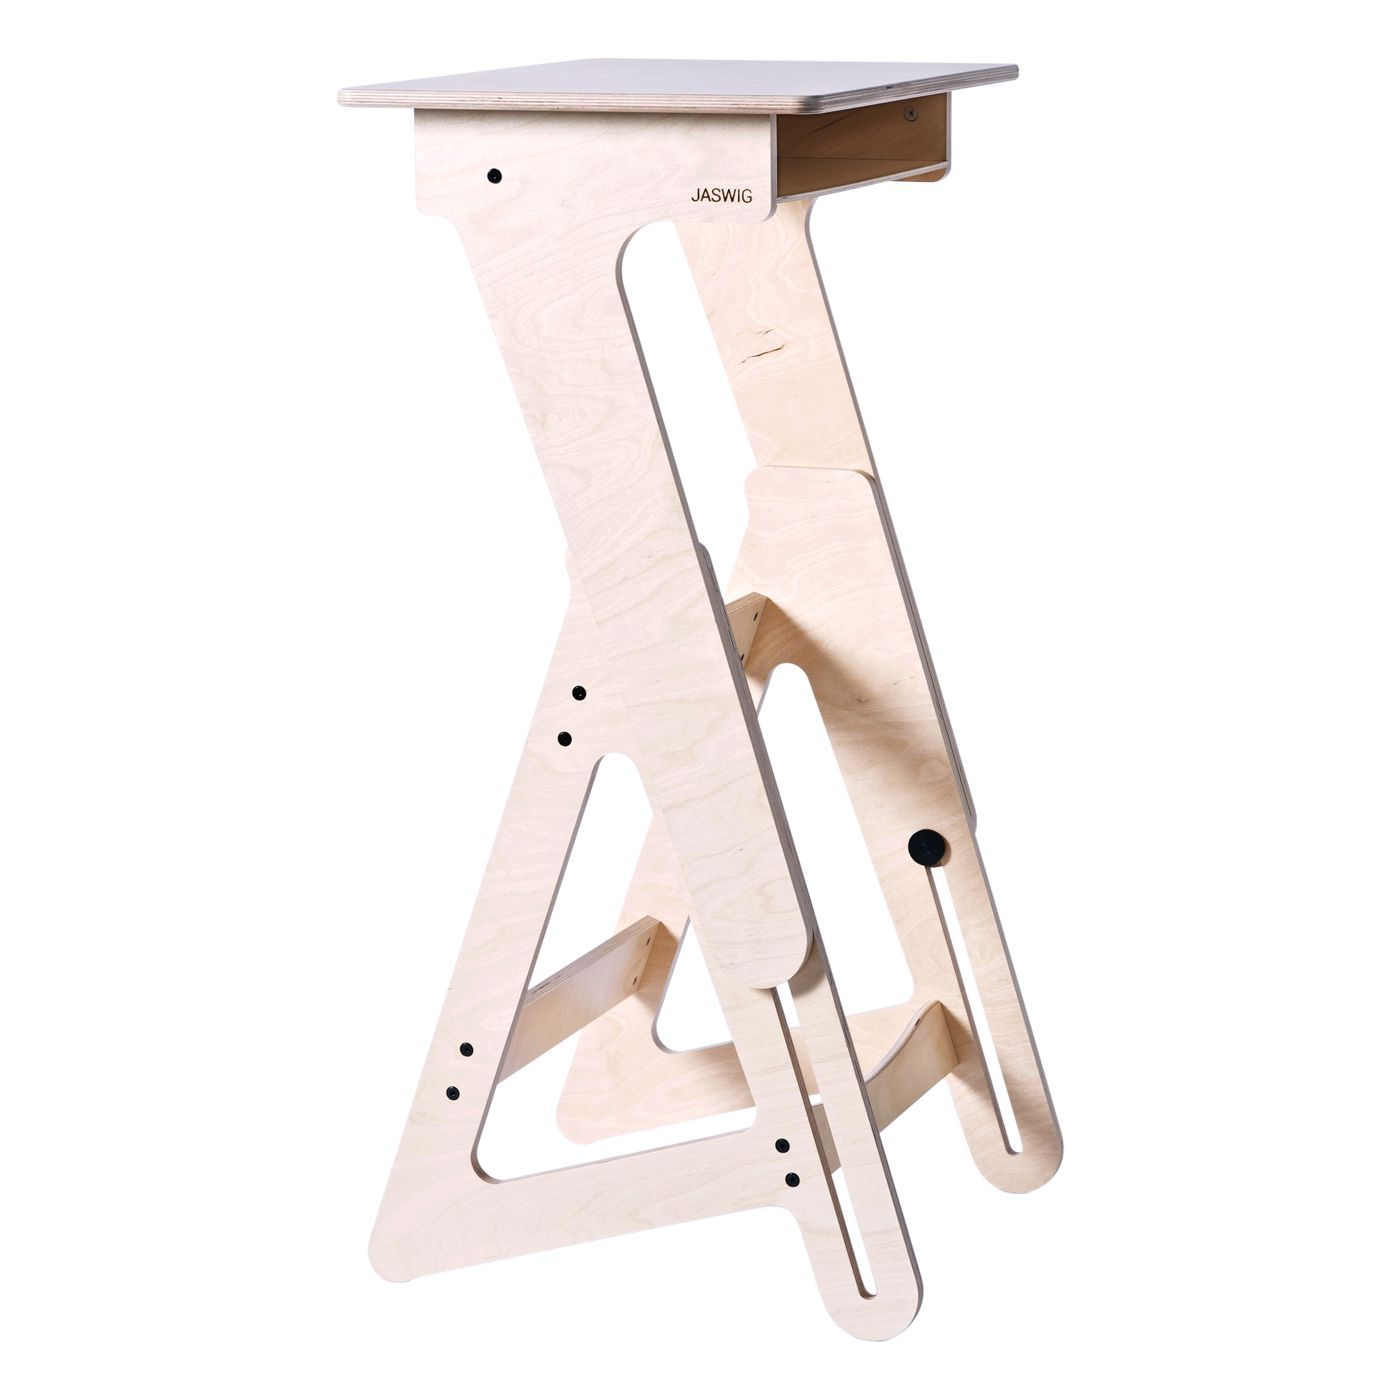 Scandinavian Designs Stand Up Desk : Common features of scandinavian interior design contemporist